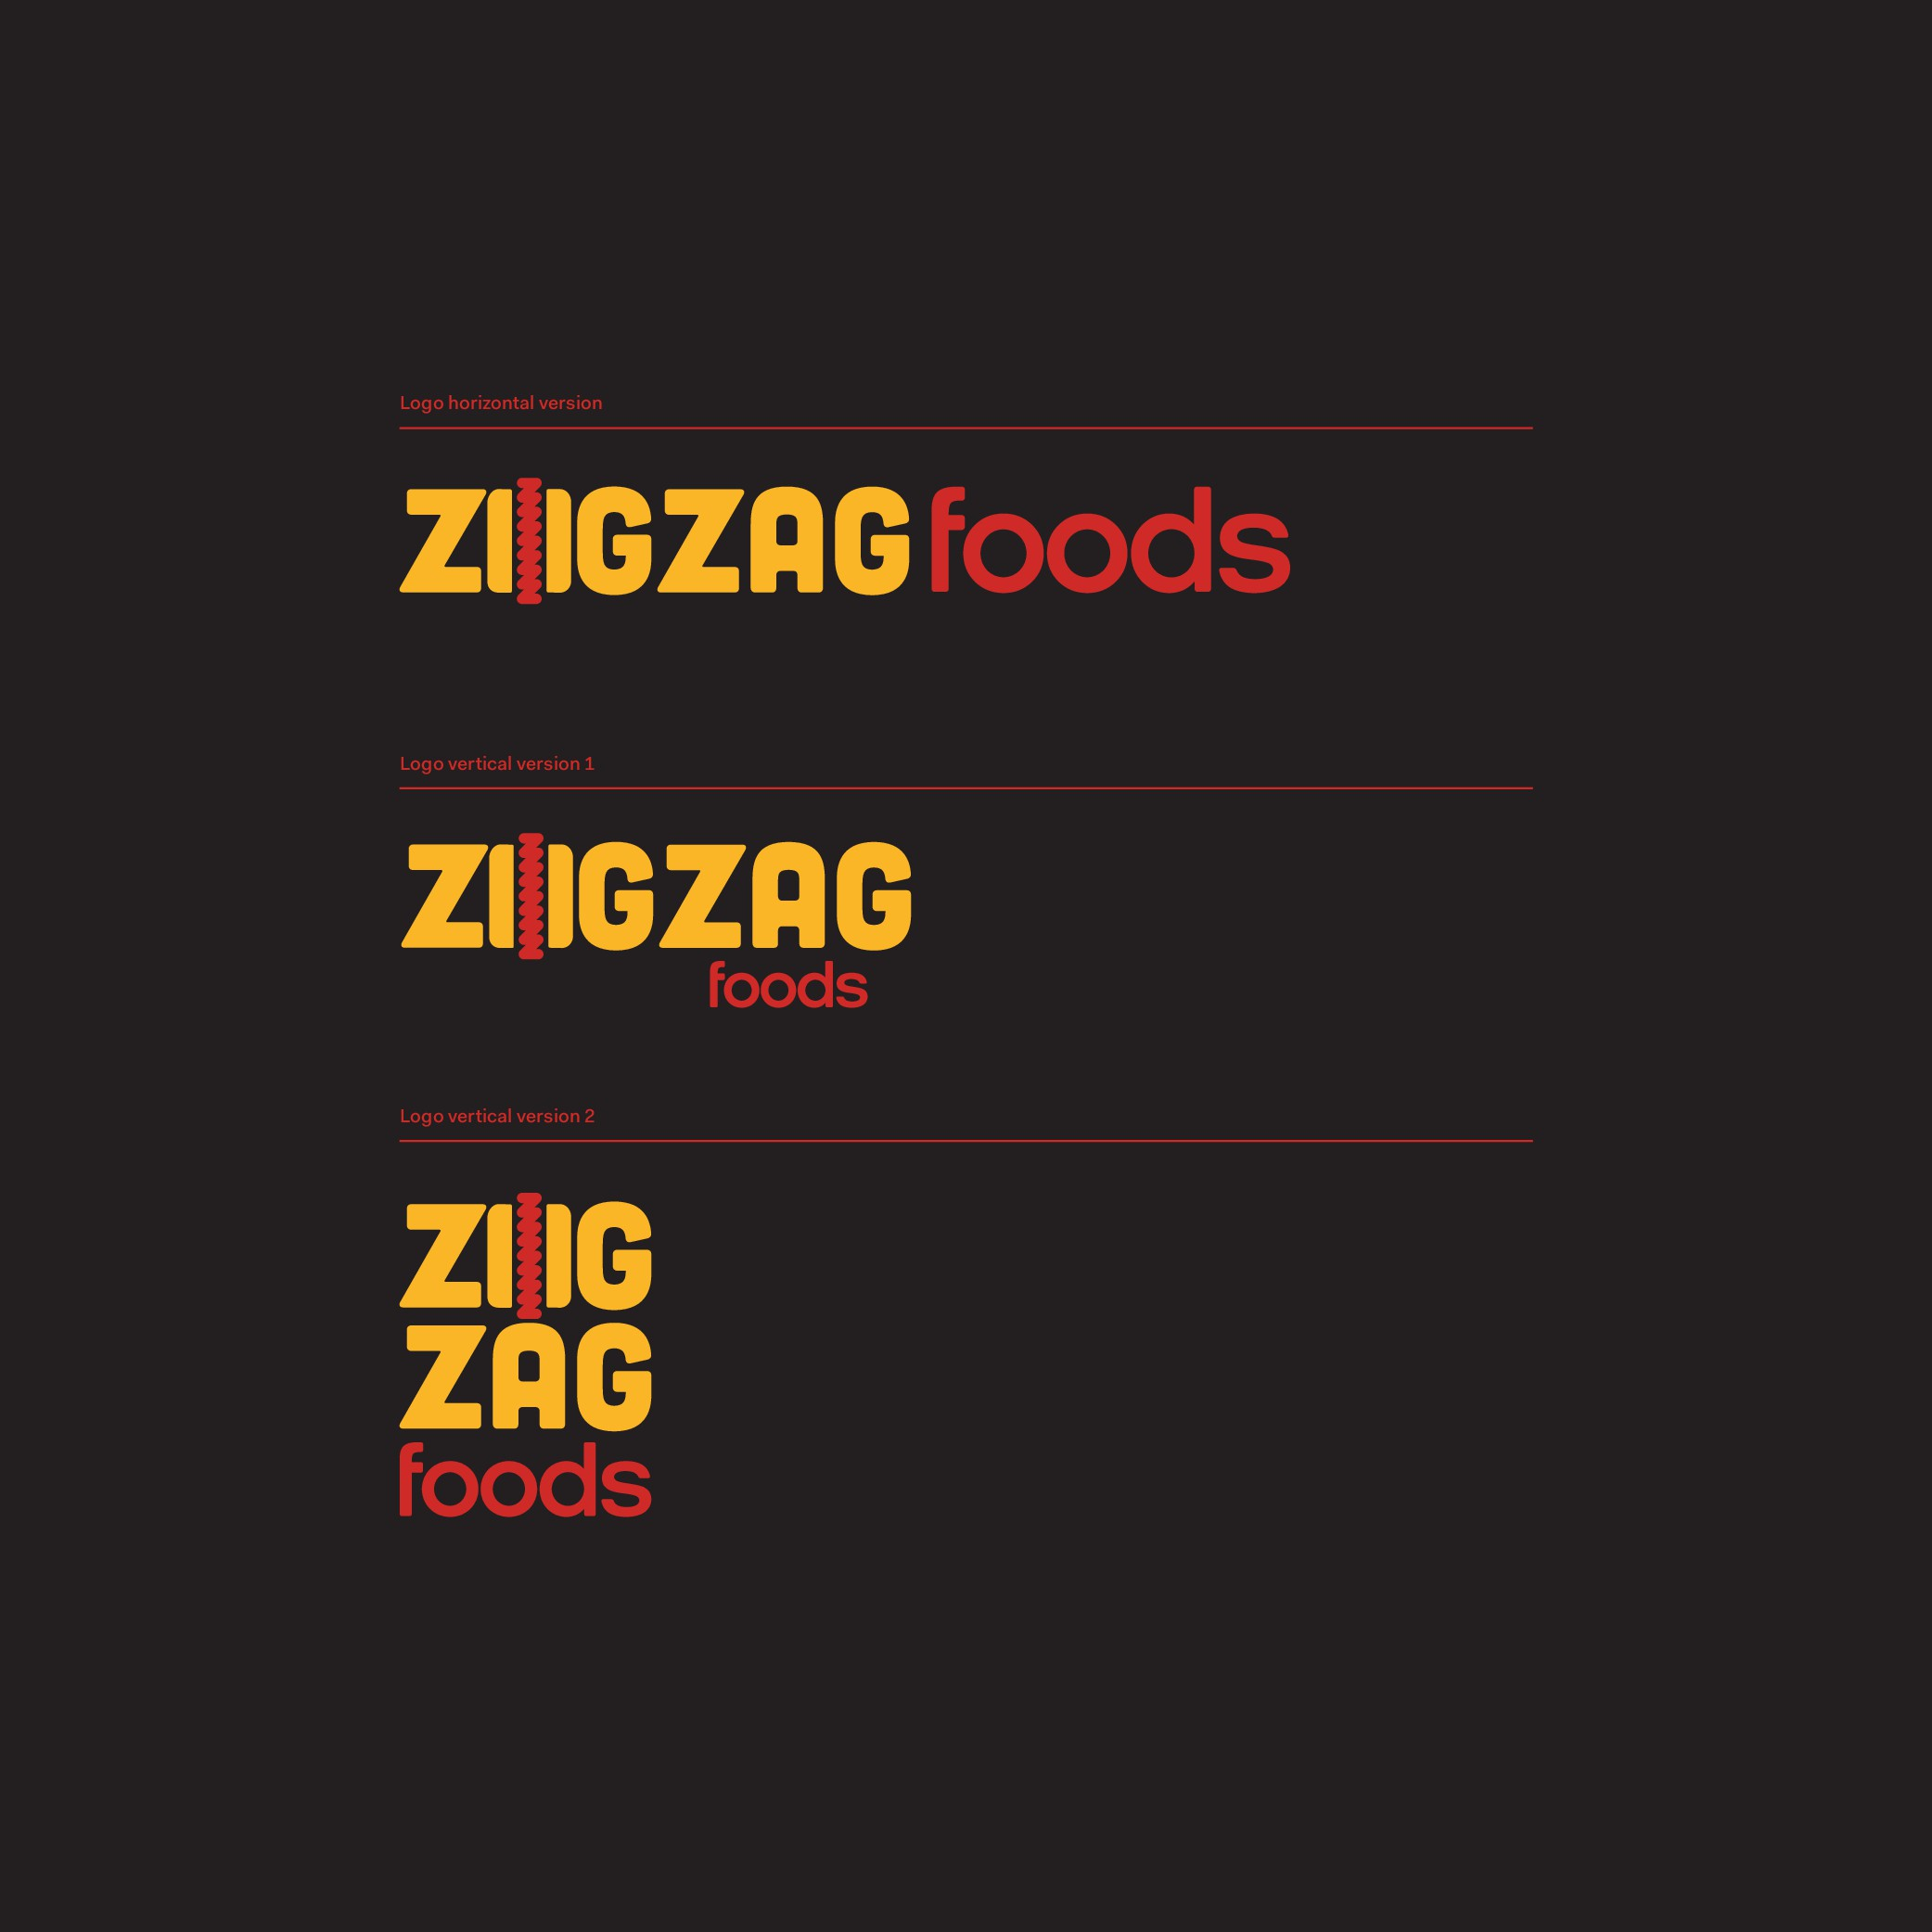 Zig Zag Hot Dogs